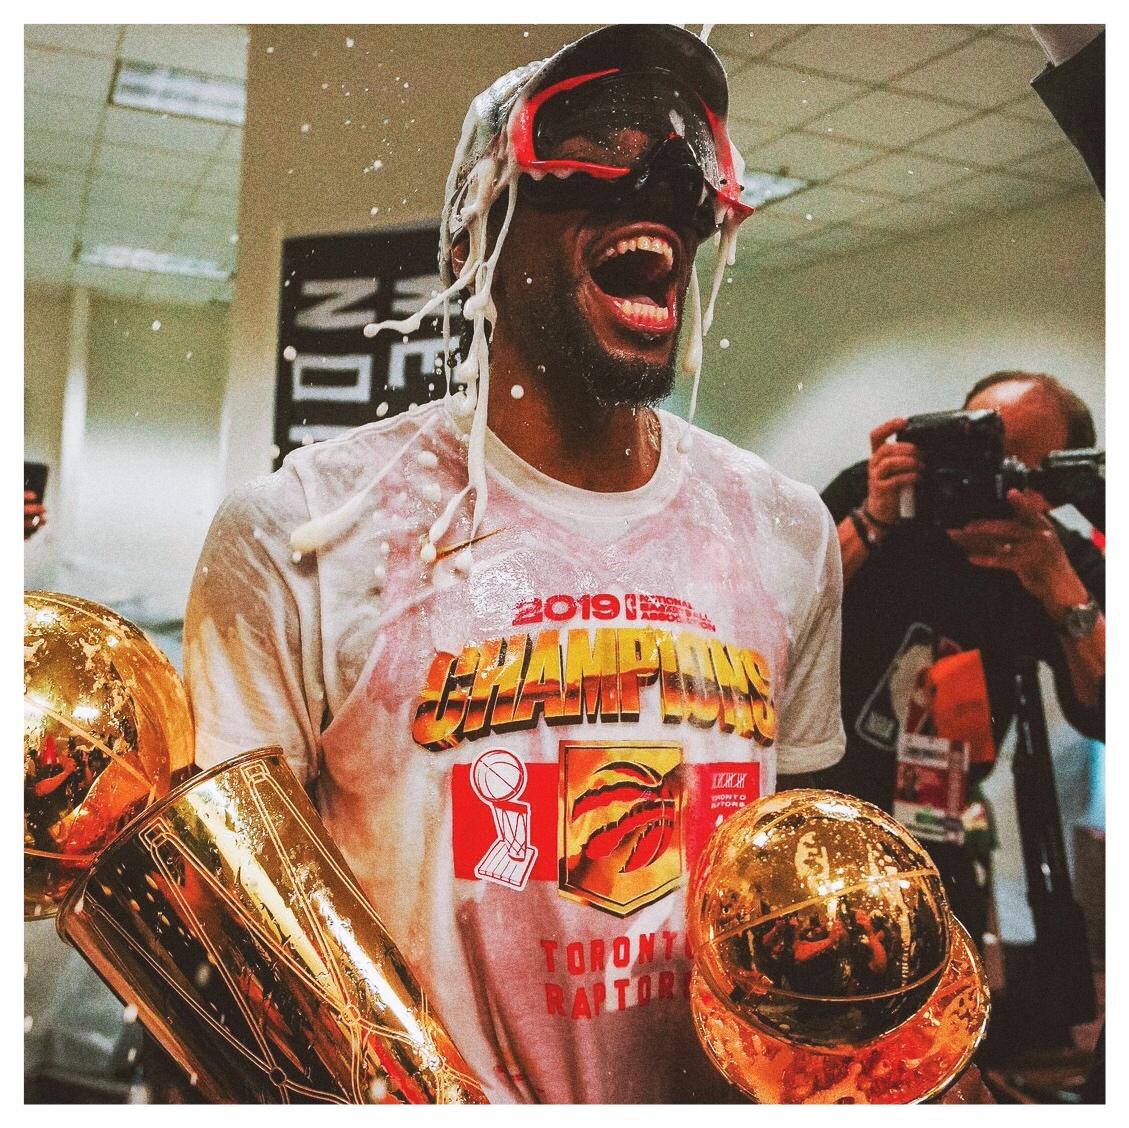 Kawhi: 2019 Finals MVP